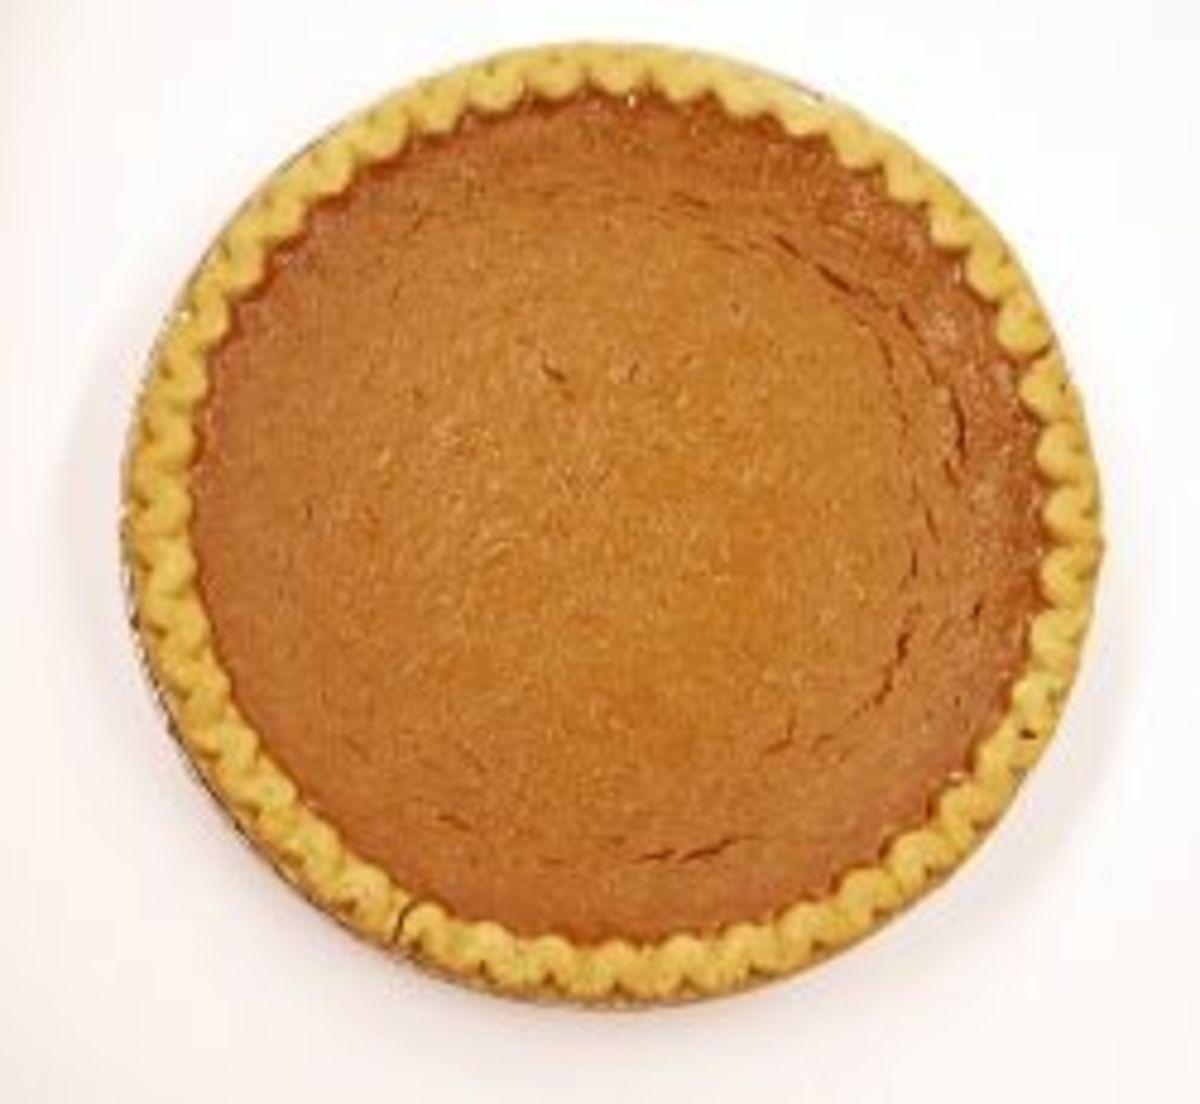 How to Make a Pumpkin Pie from a Real Pumpkin